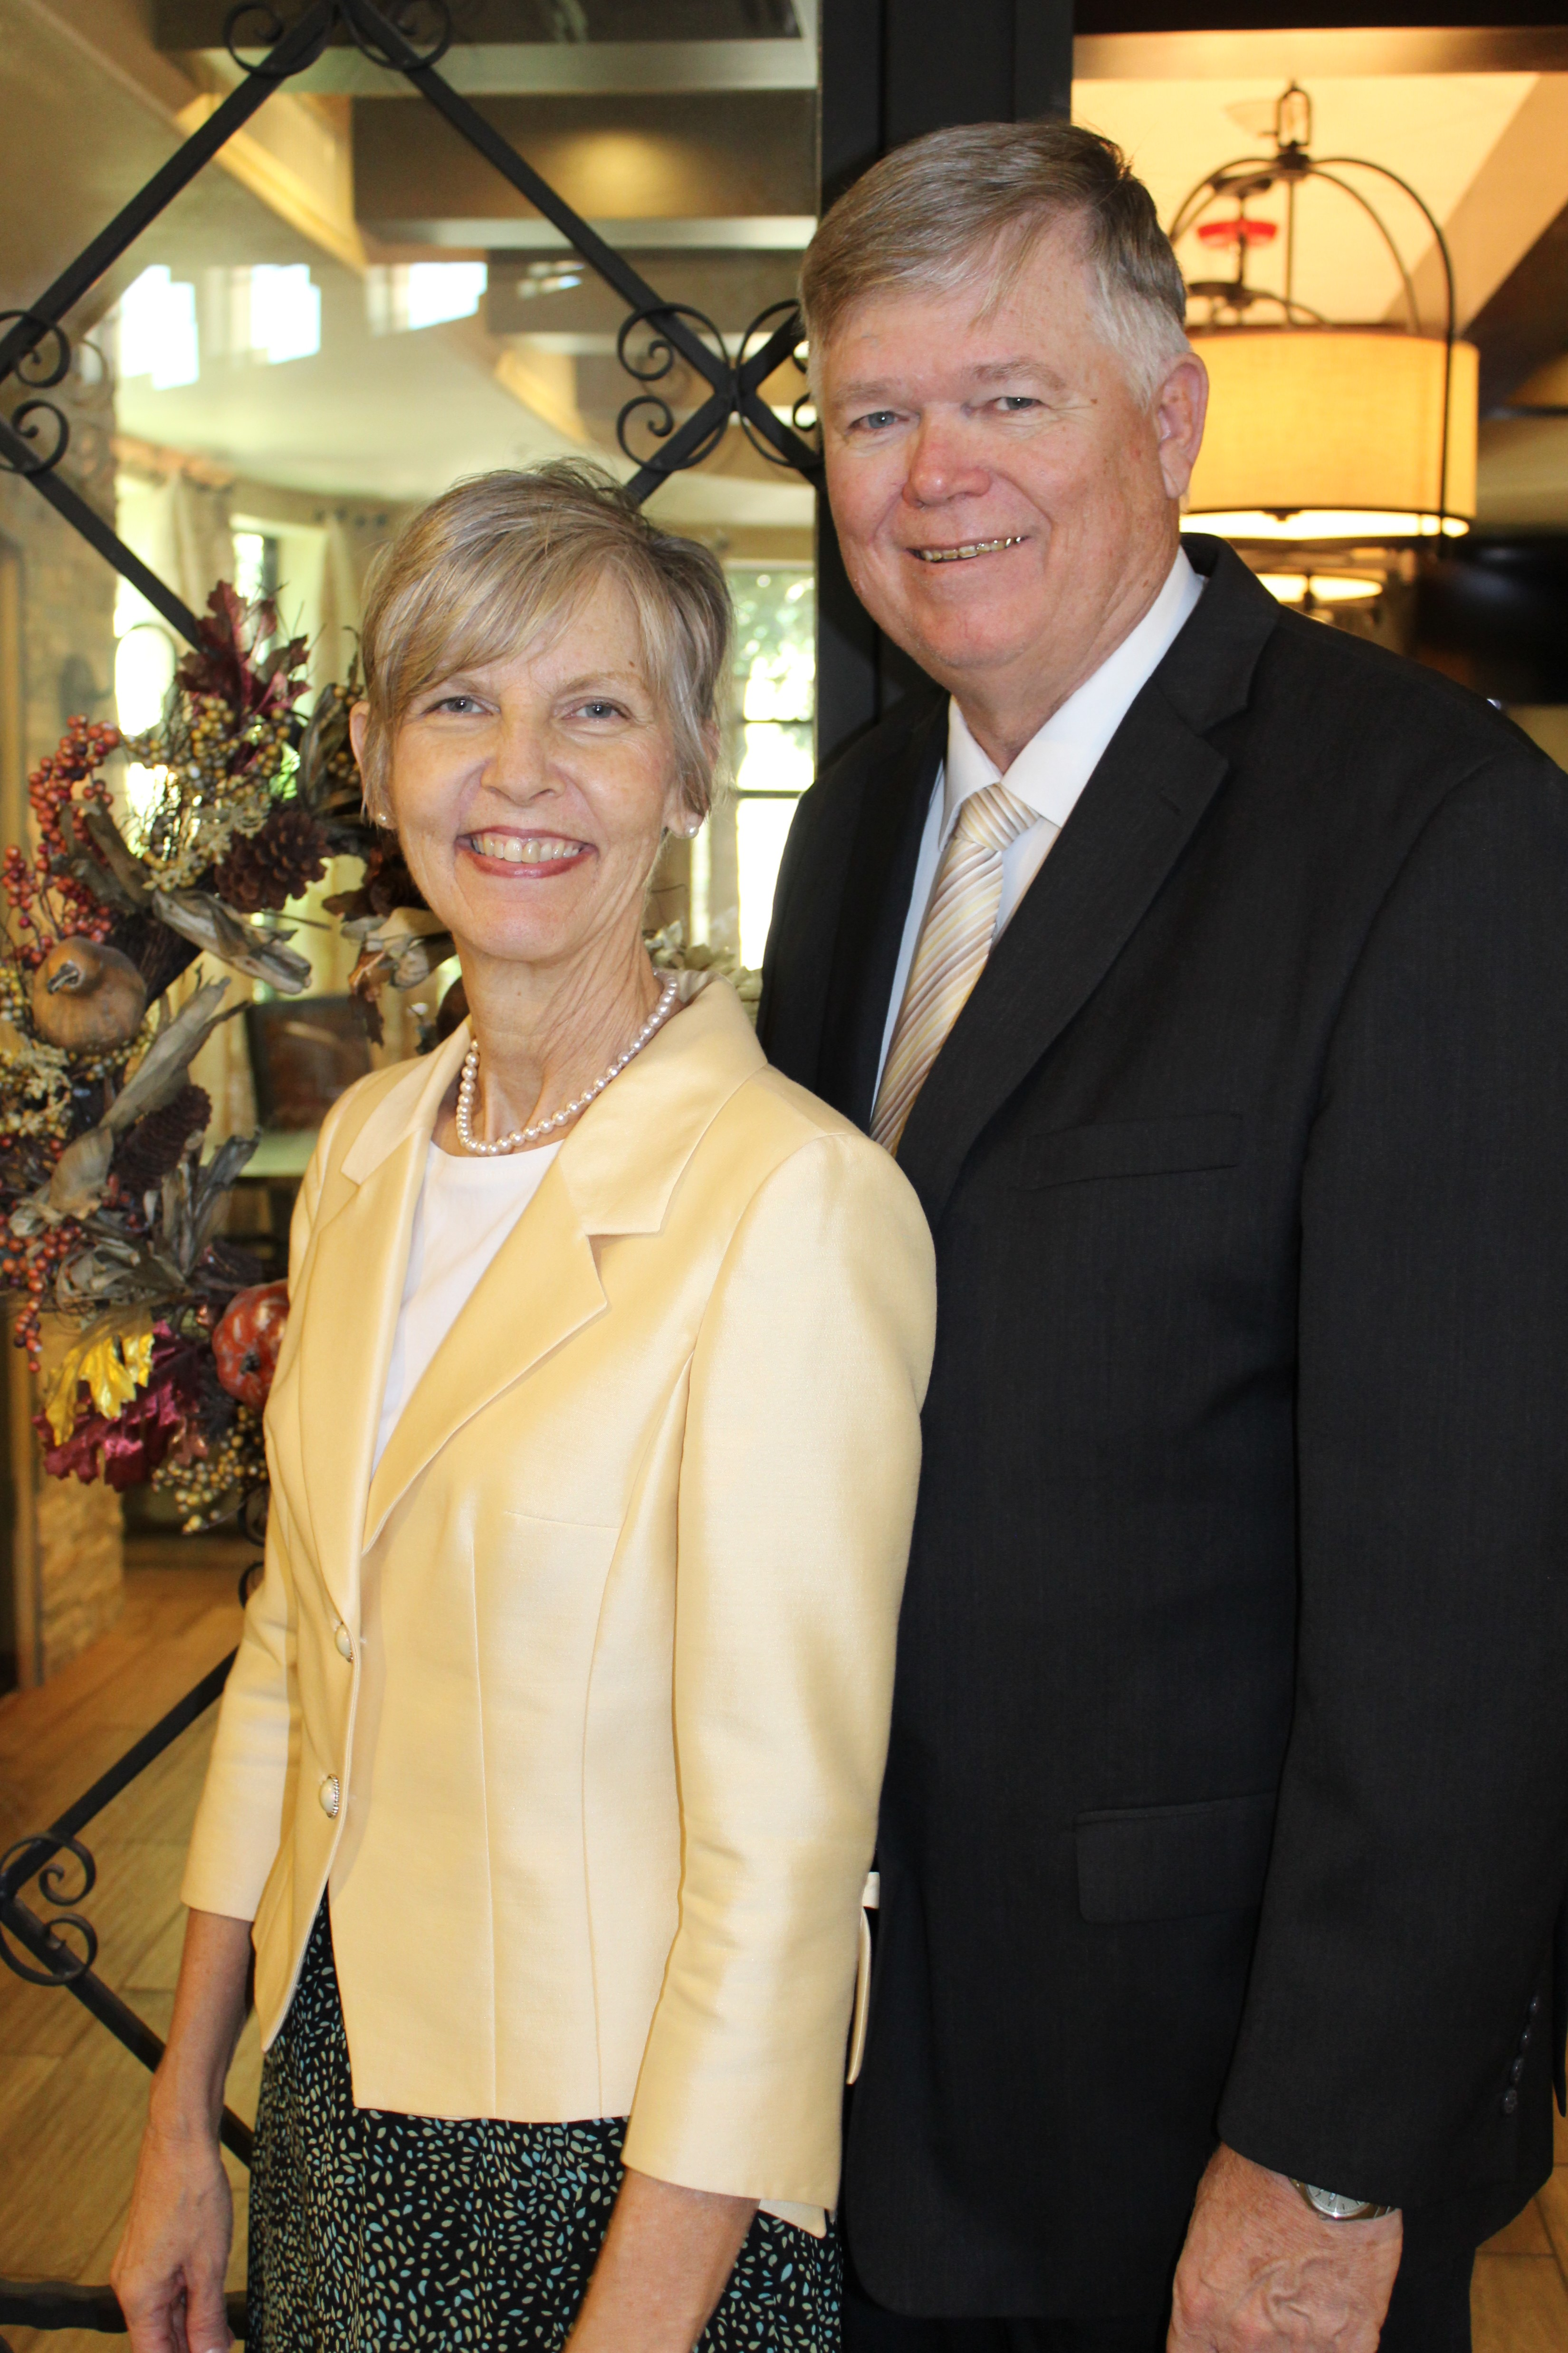 Kathleen Loveland Stapley and Gary Lin Stapley